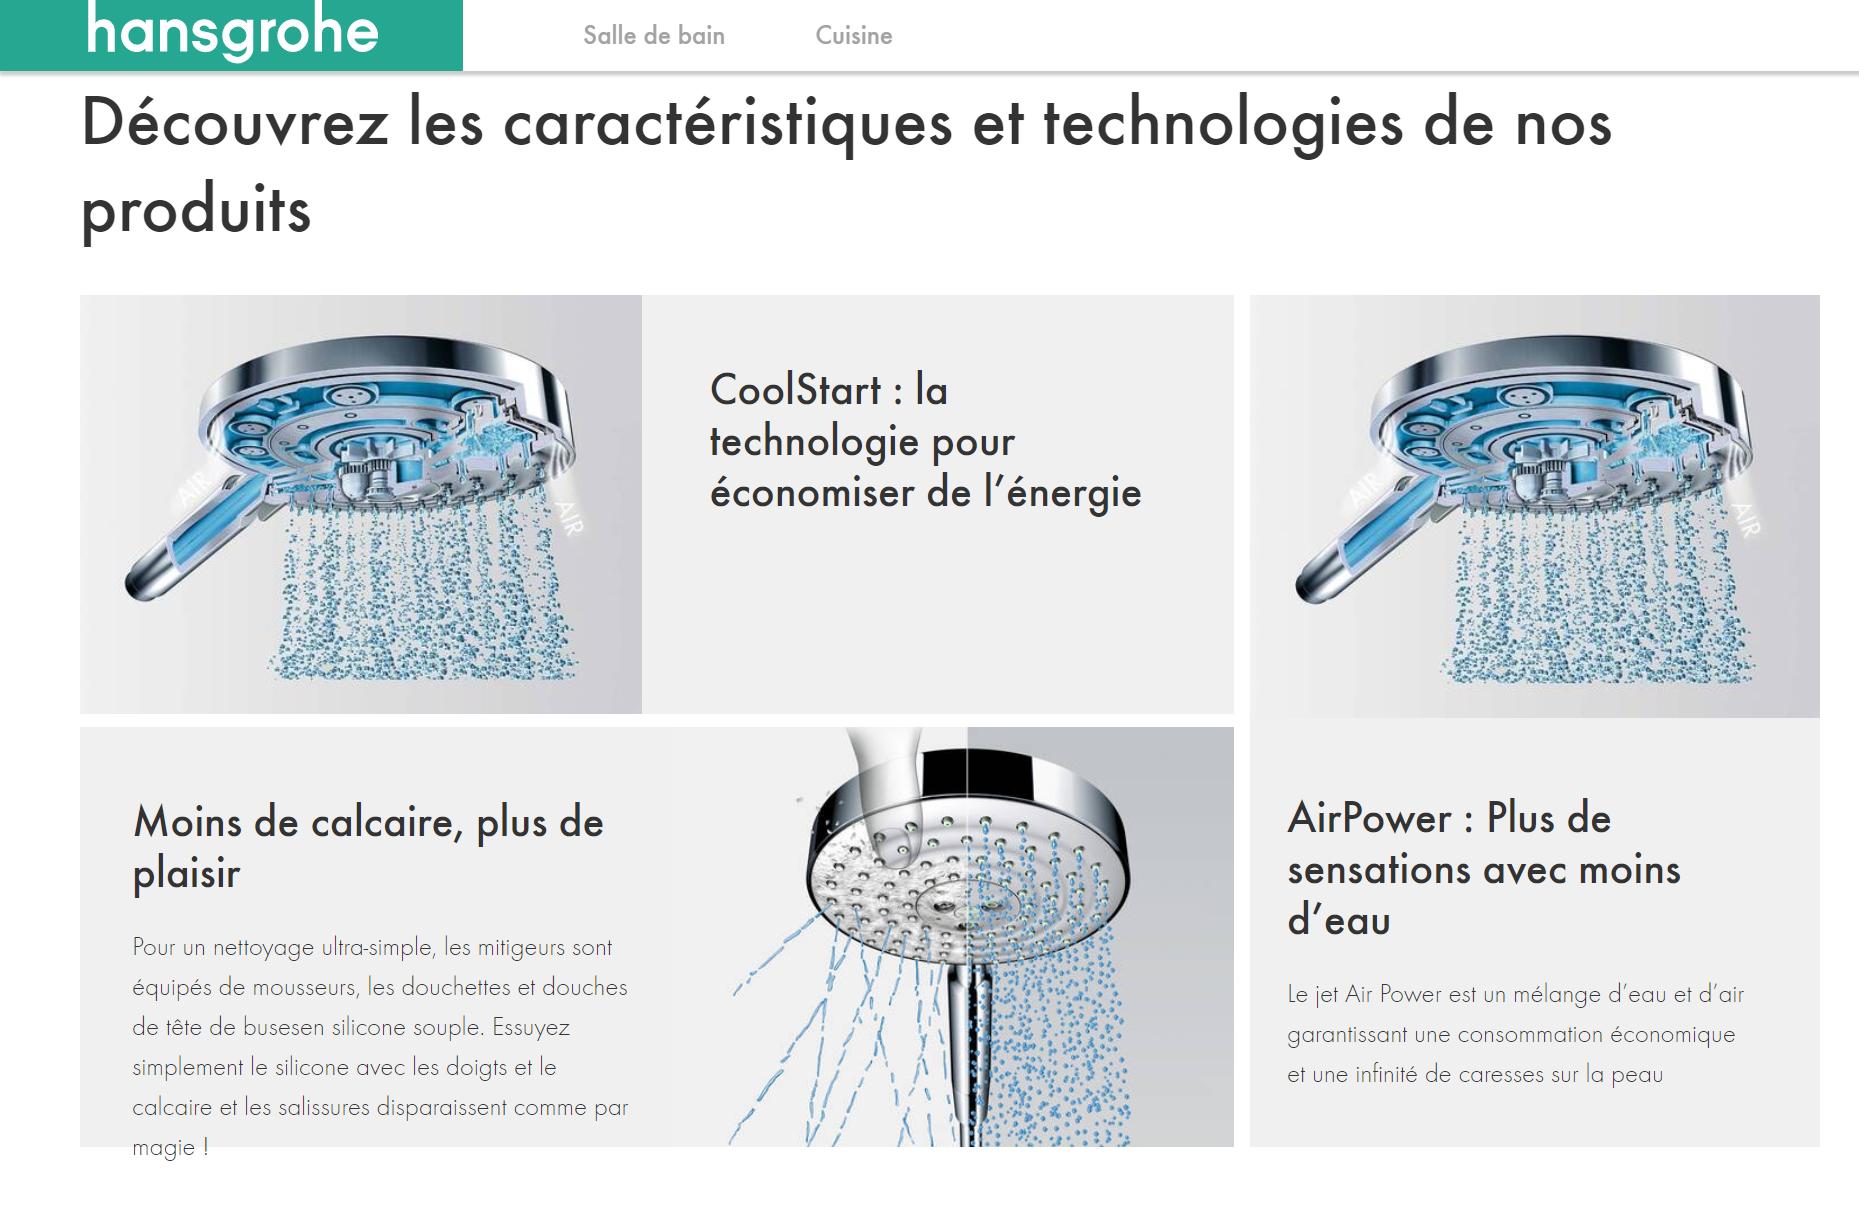 Sanitaire Tunisie - Lavabo Tunisie - Salle de bain Tunisie - Baignoire Tunisie - Toilette Tunisie - Technologies Hansgrohe